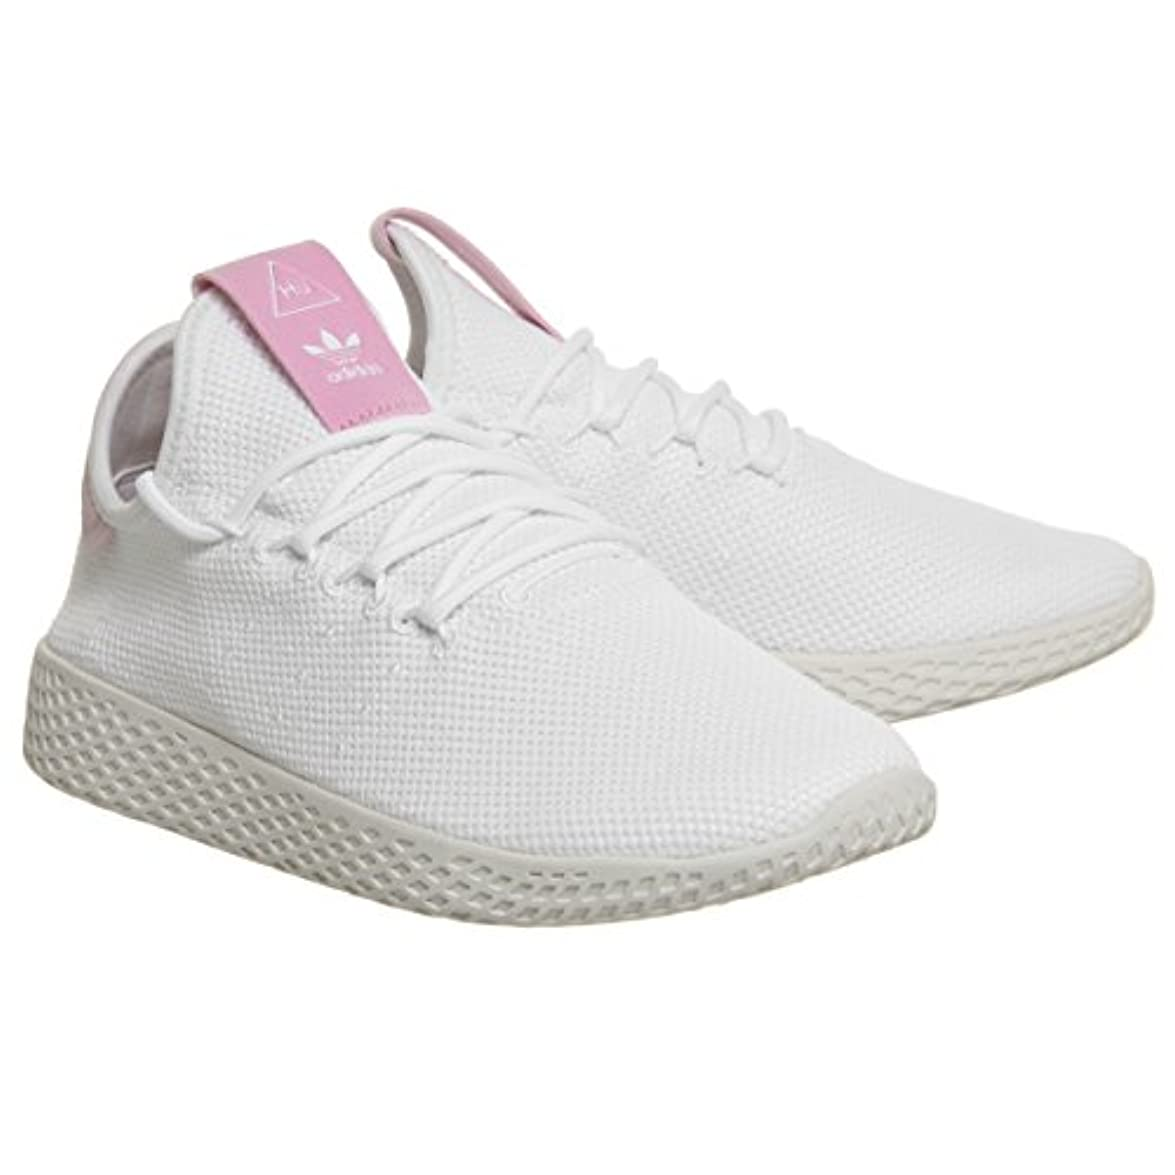 Adidas Pw Tennis Hu W Donna Scarpe Da Ginnastica